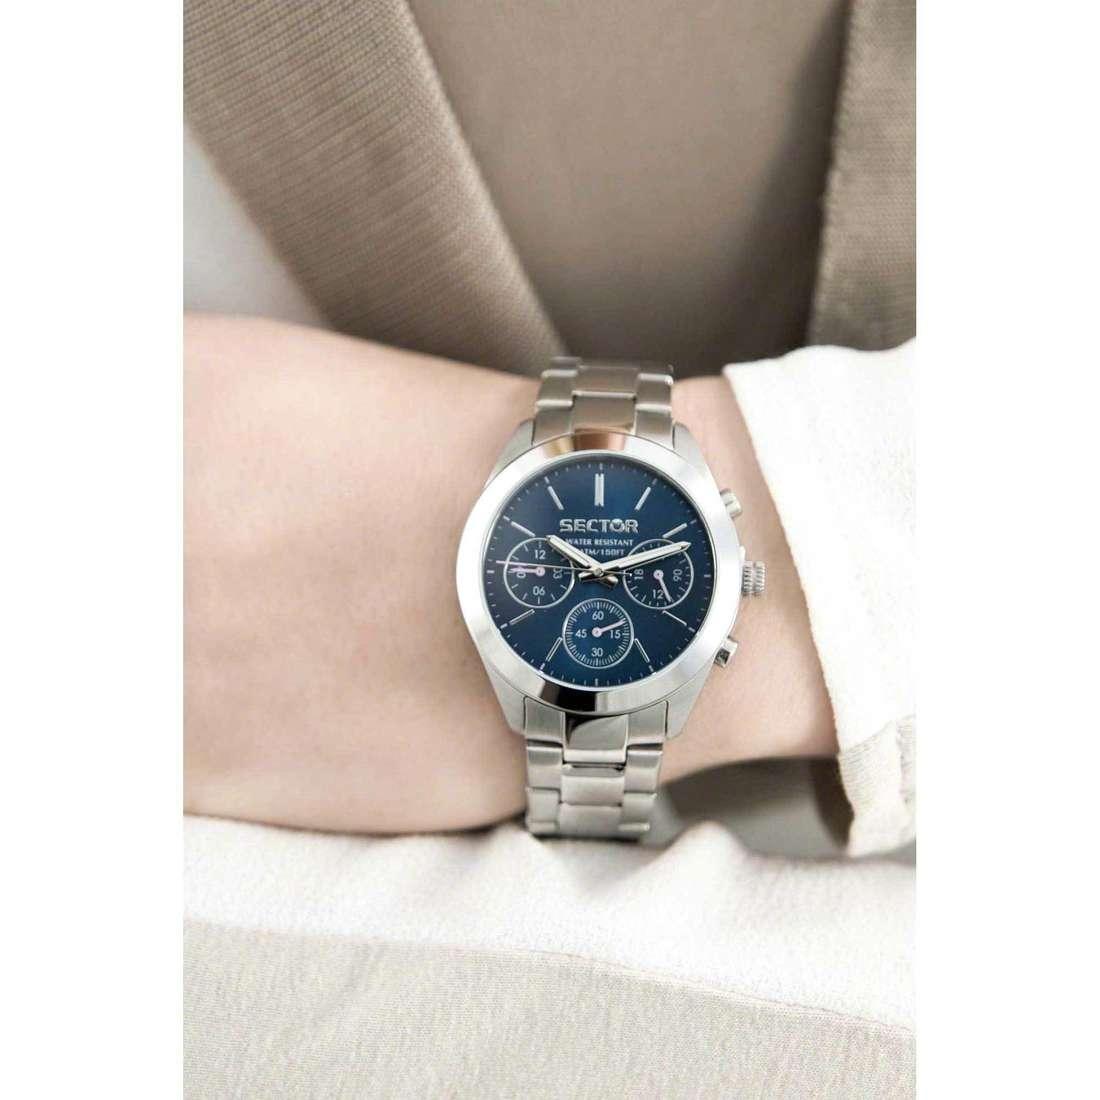 Sector cronografi 120 donna R3253588501 indosso